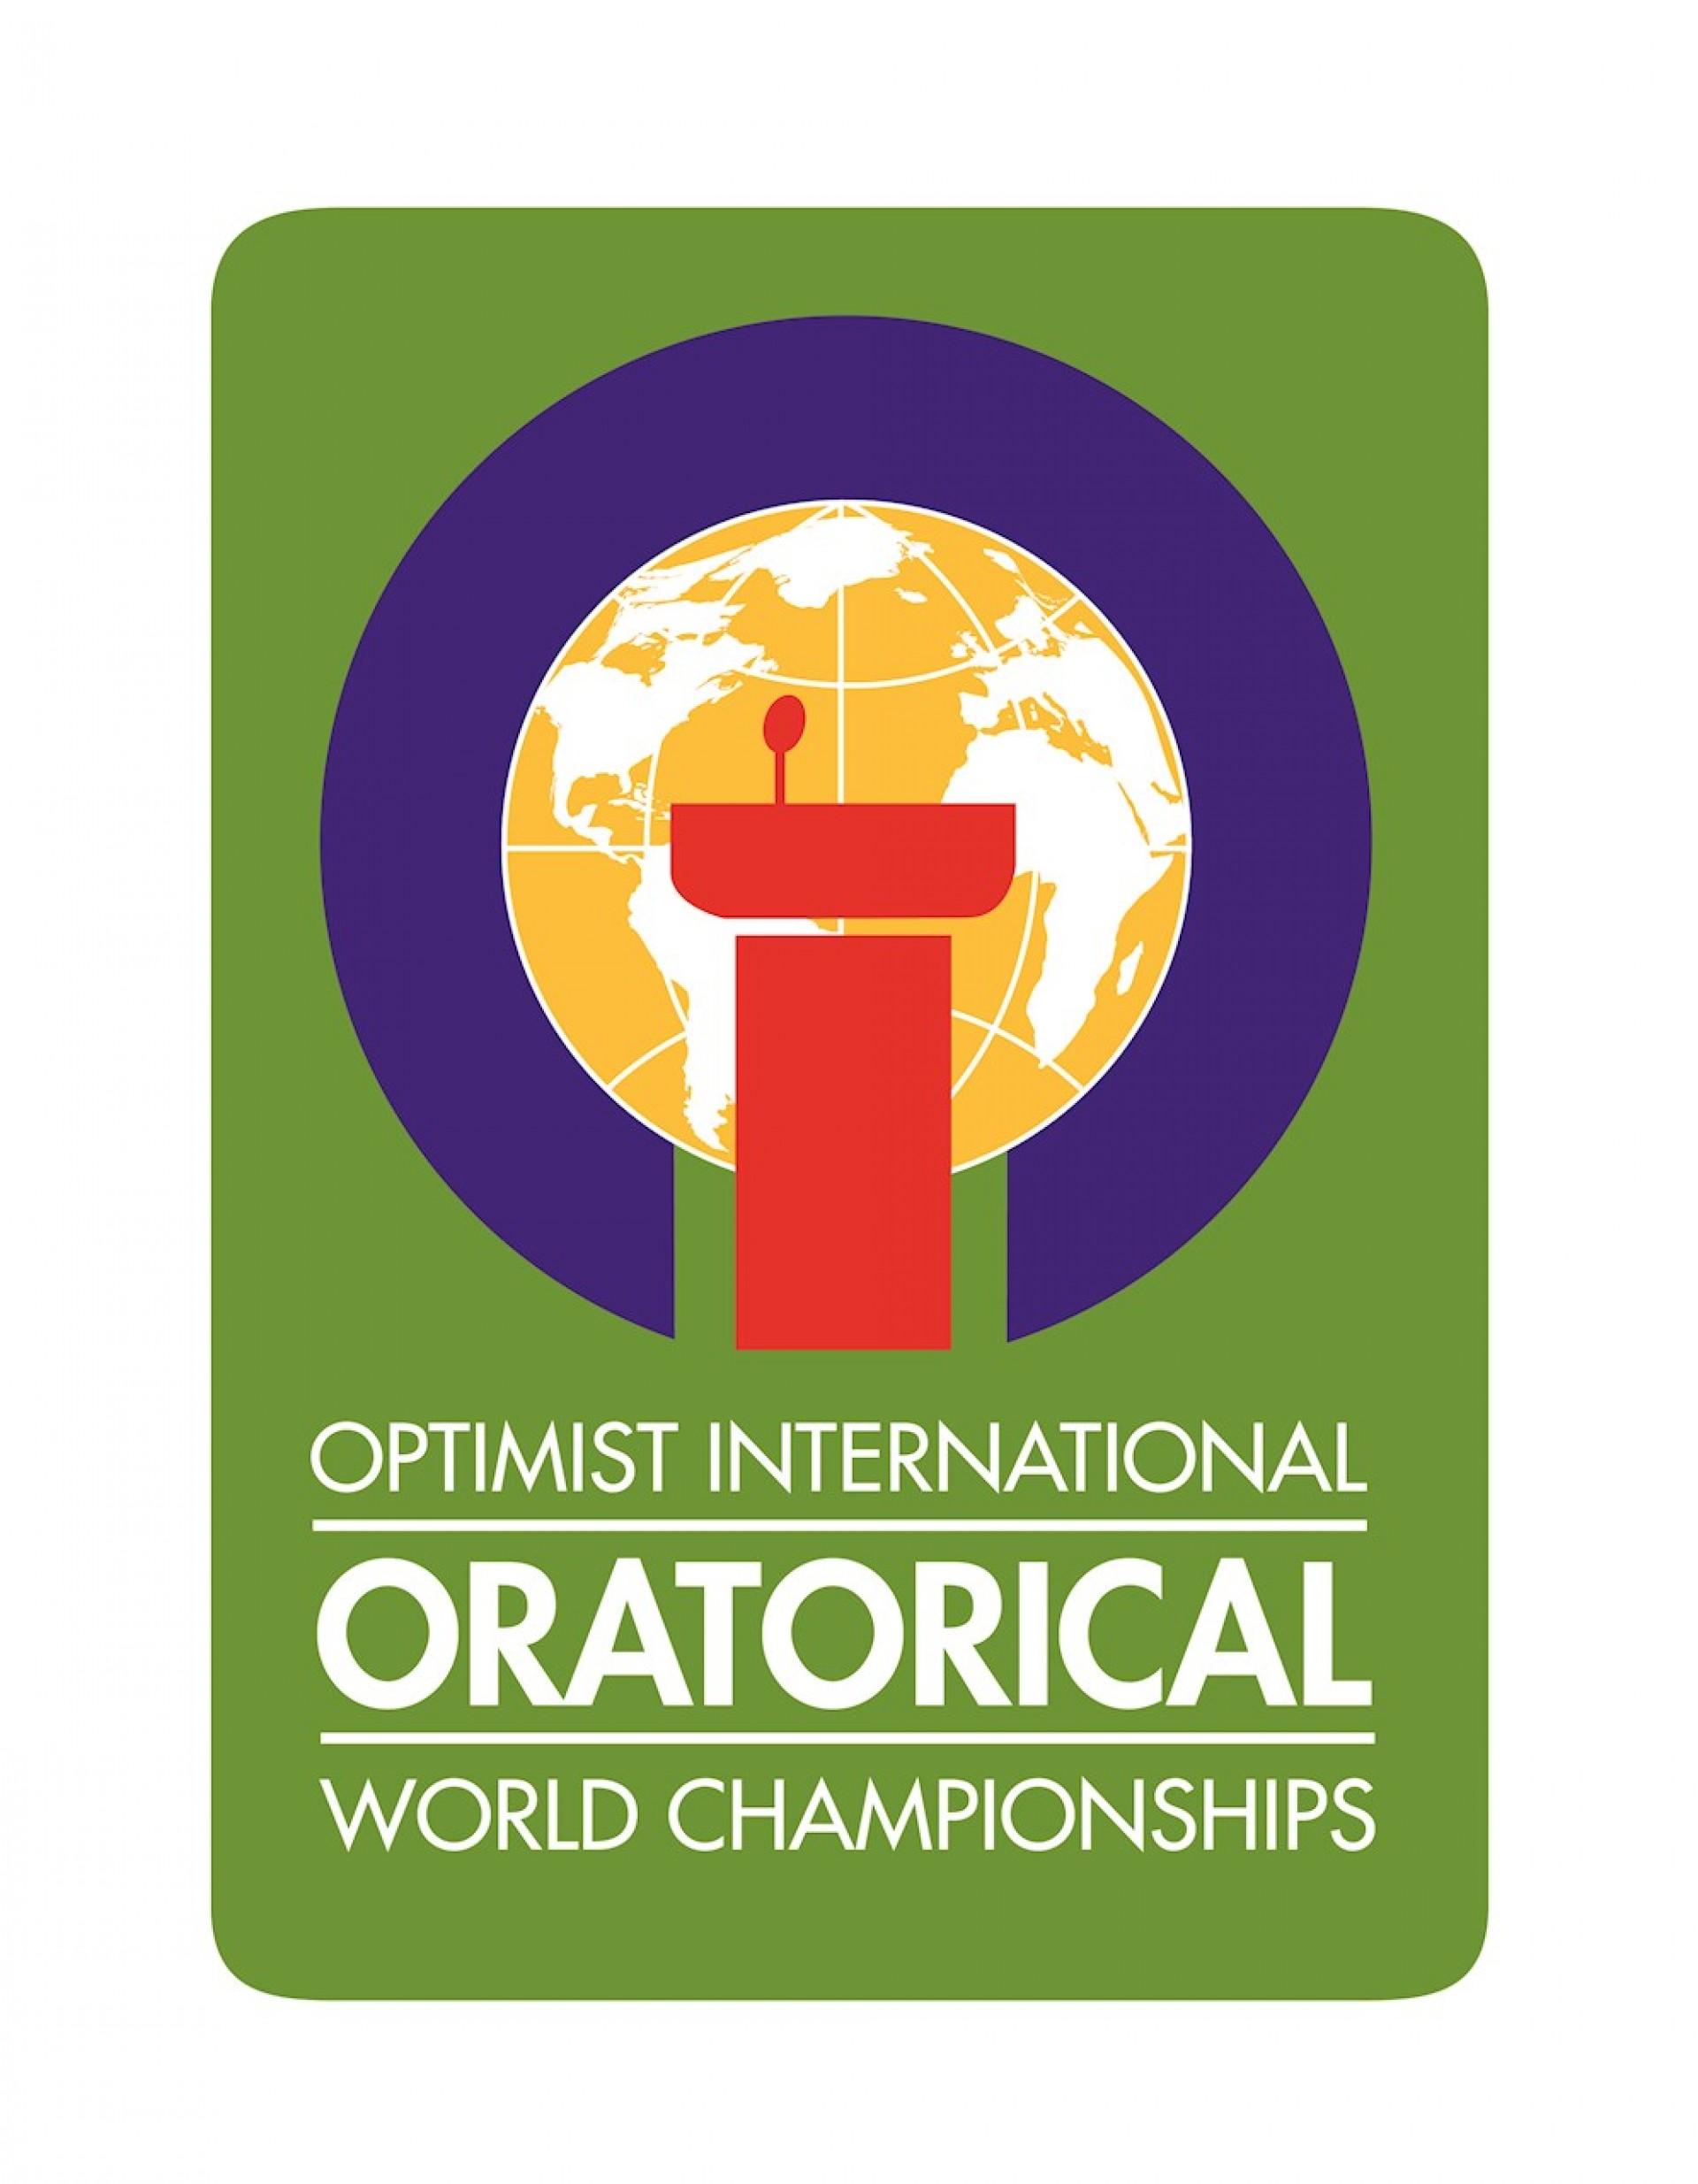 006 Optimist International Essay Contest Example Oratorical High Wondrous Winners Rules 1920